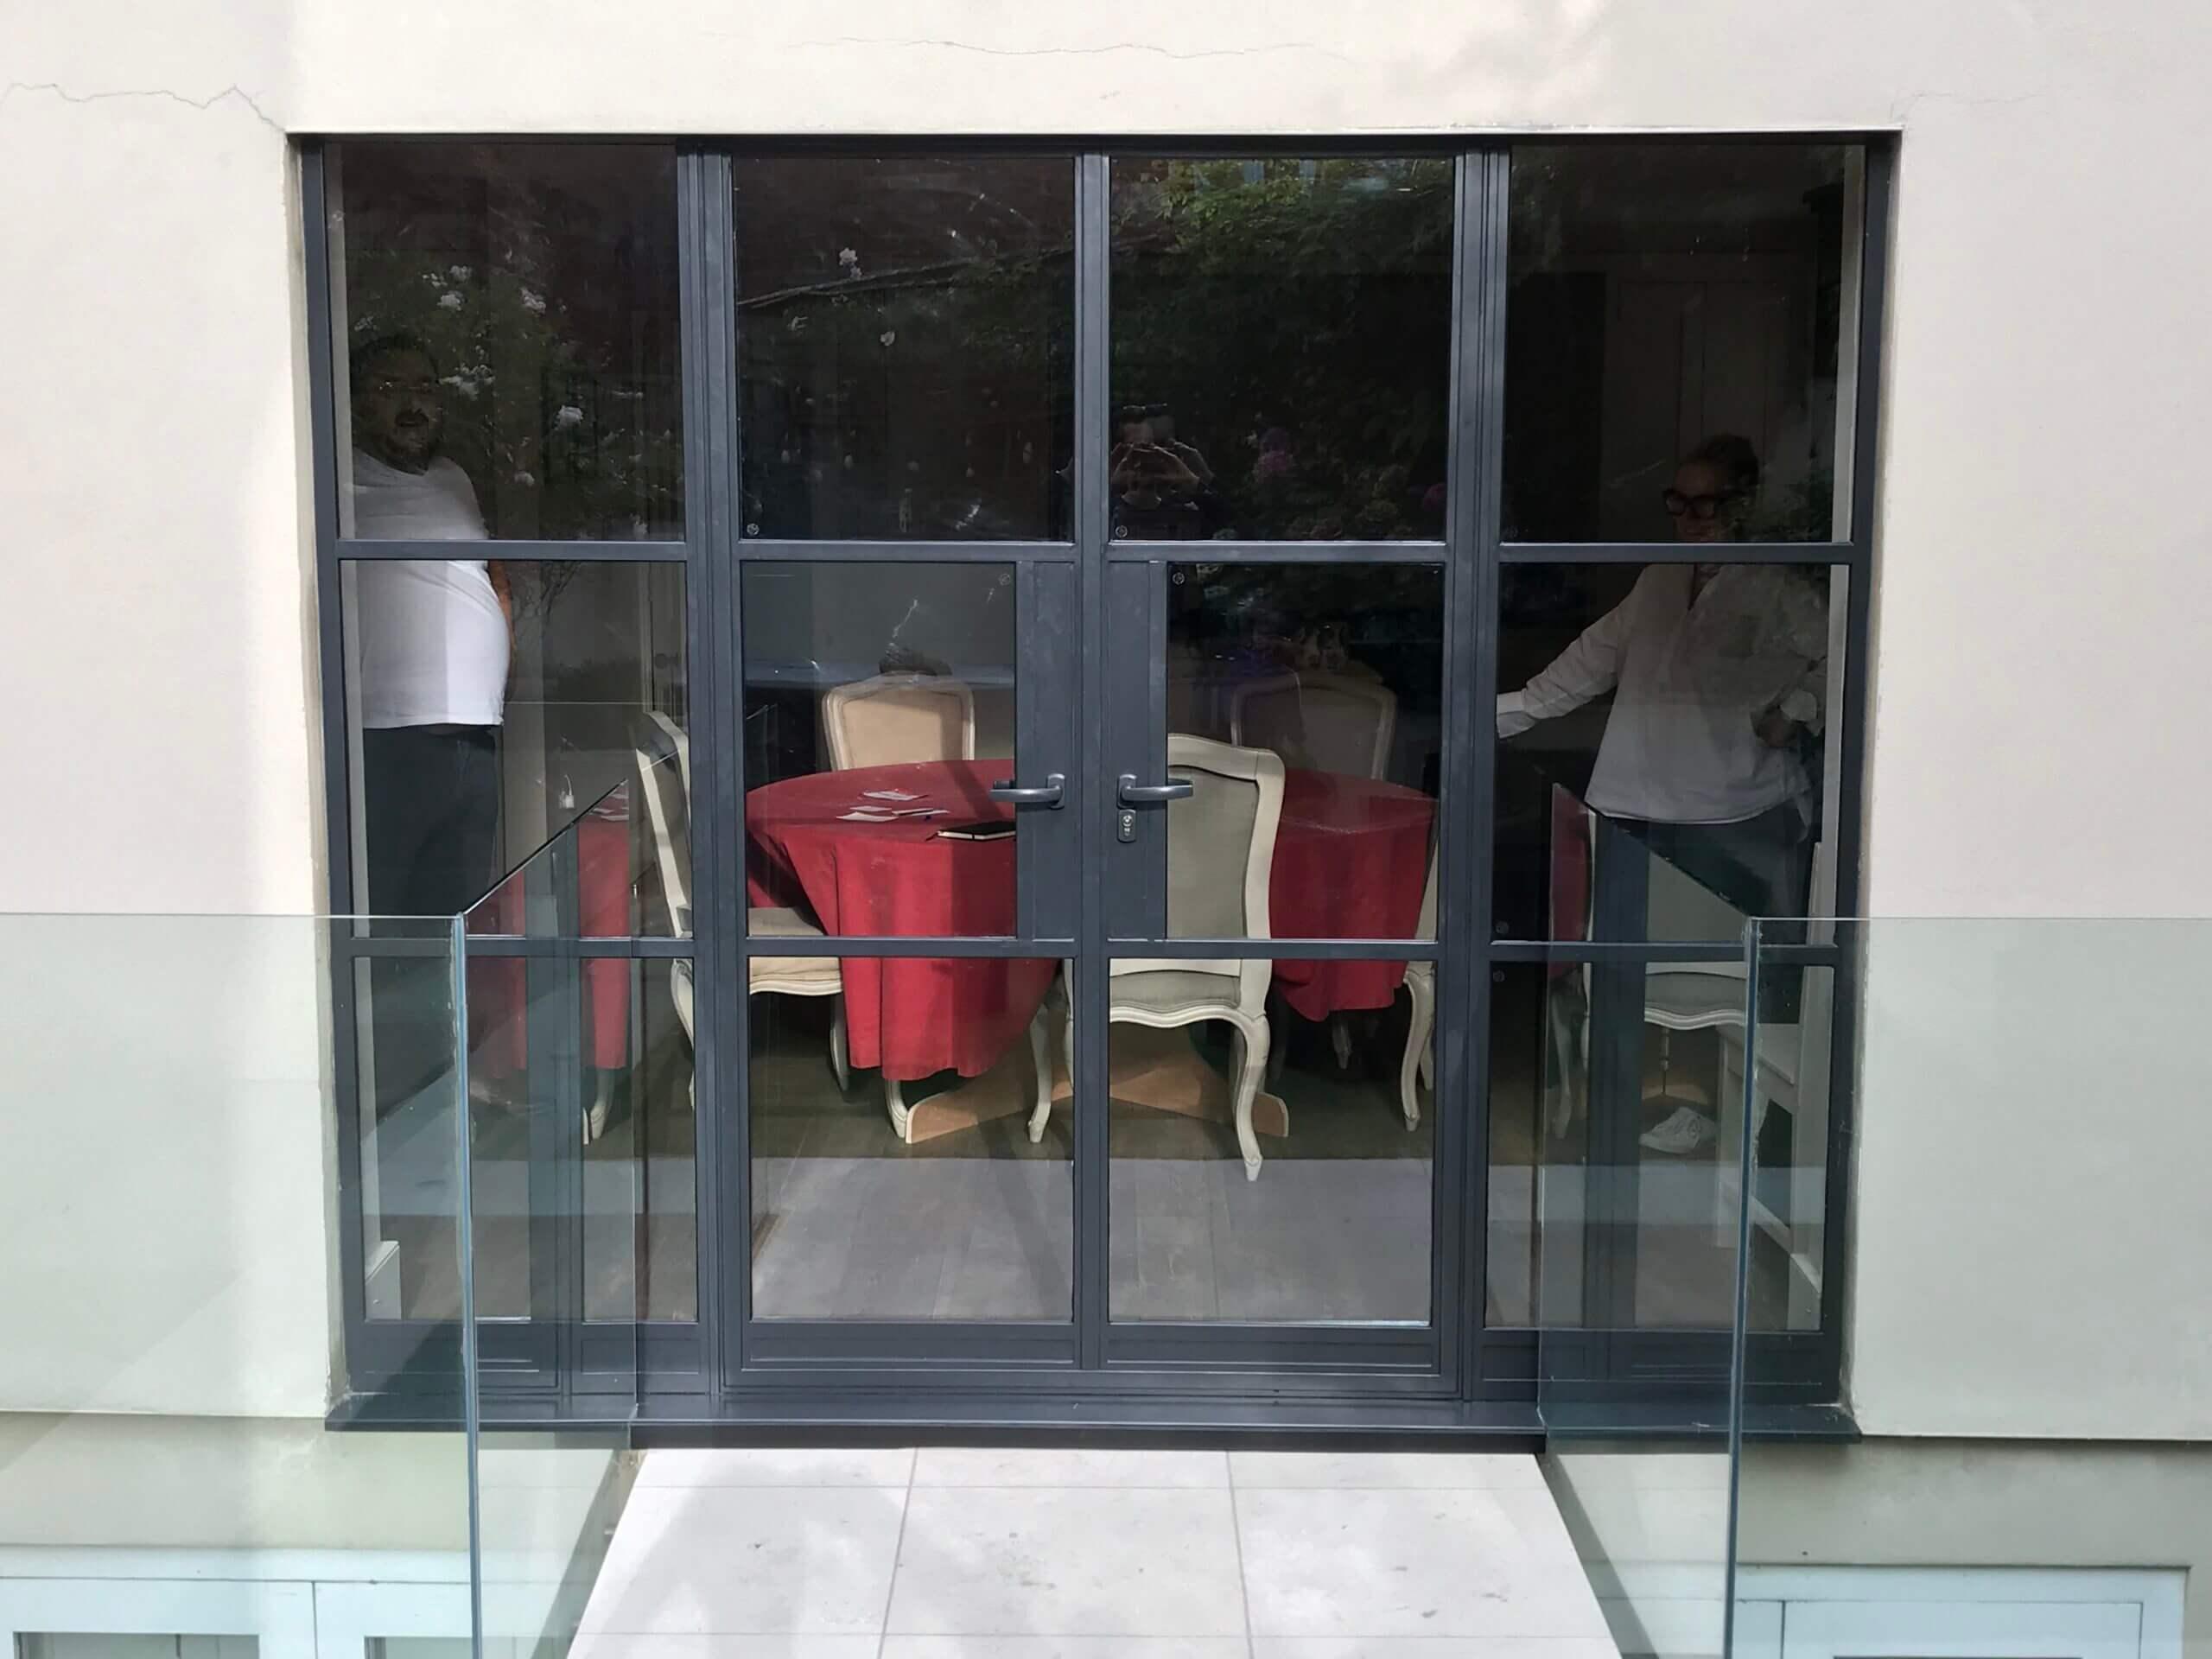 External Original Steel Doors W20 W40 W50 Thermal break 7